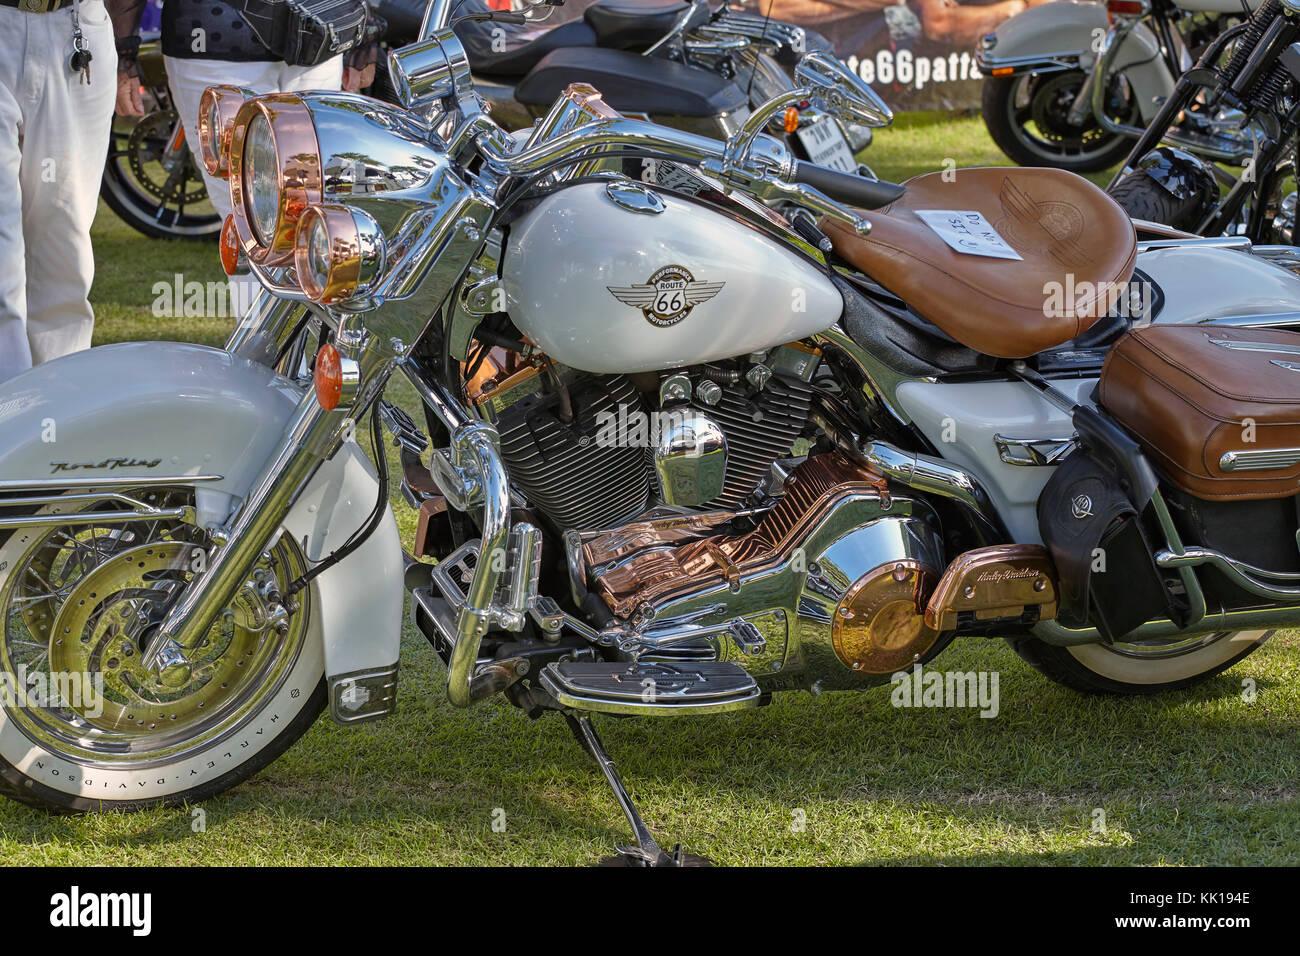 Harley Davidson Fatboy motocicleta. Motos personalizadas Imagen De Stock